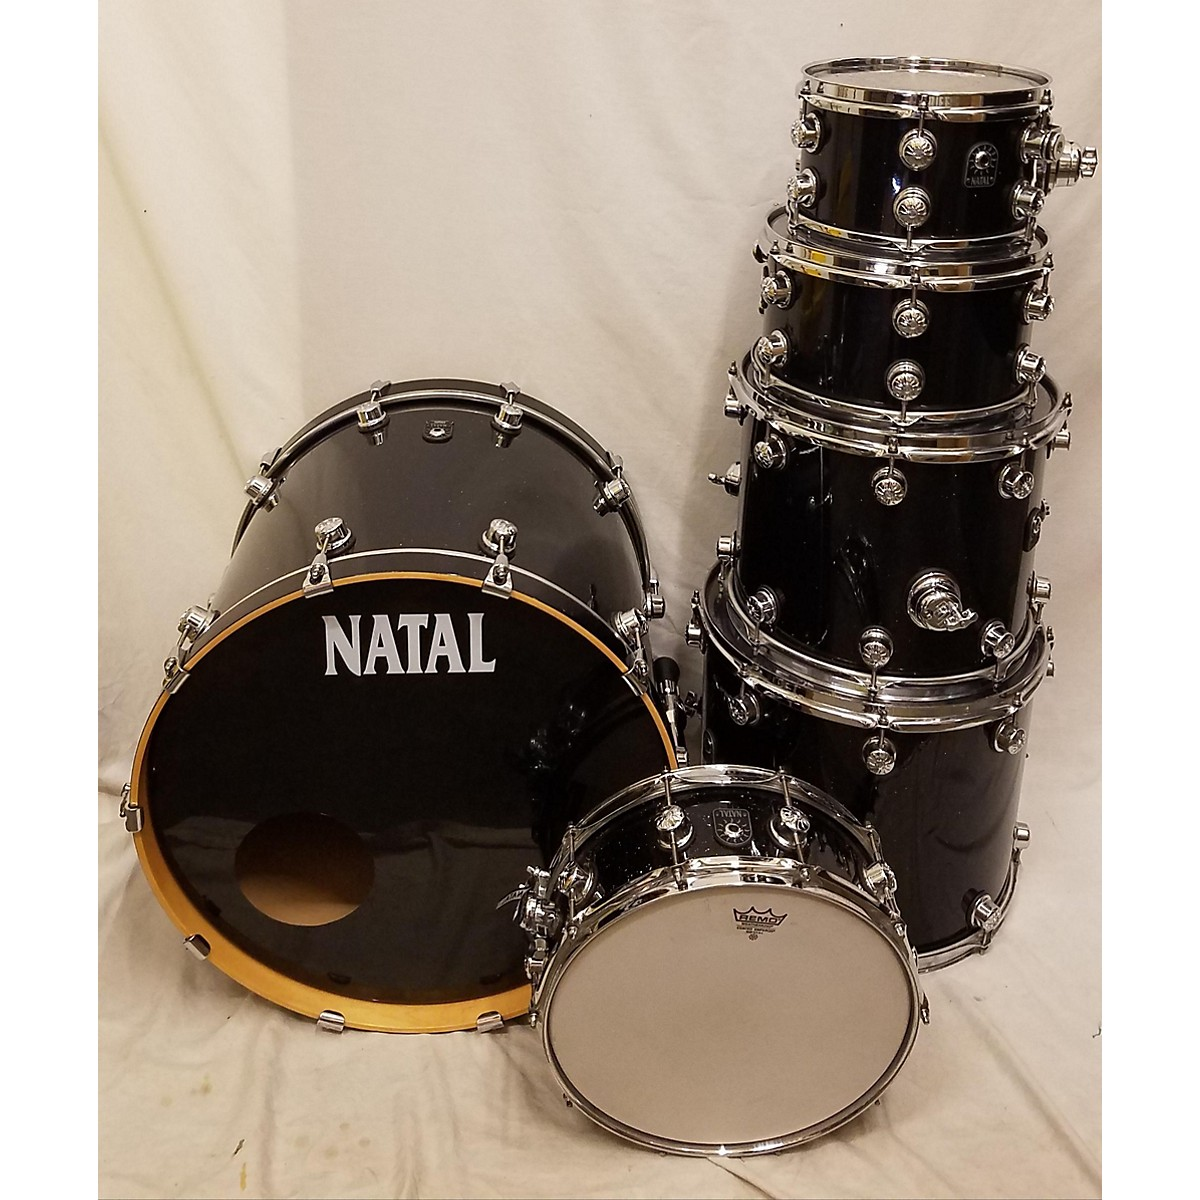 Natal Drums Maple Series Fusion Drum Kit